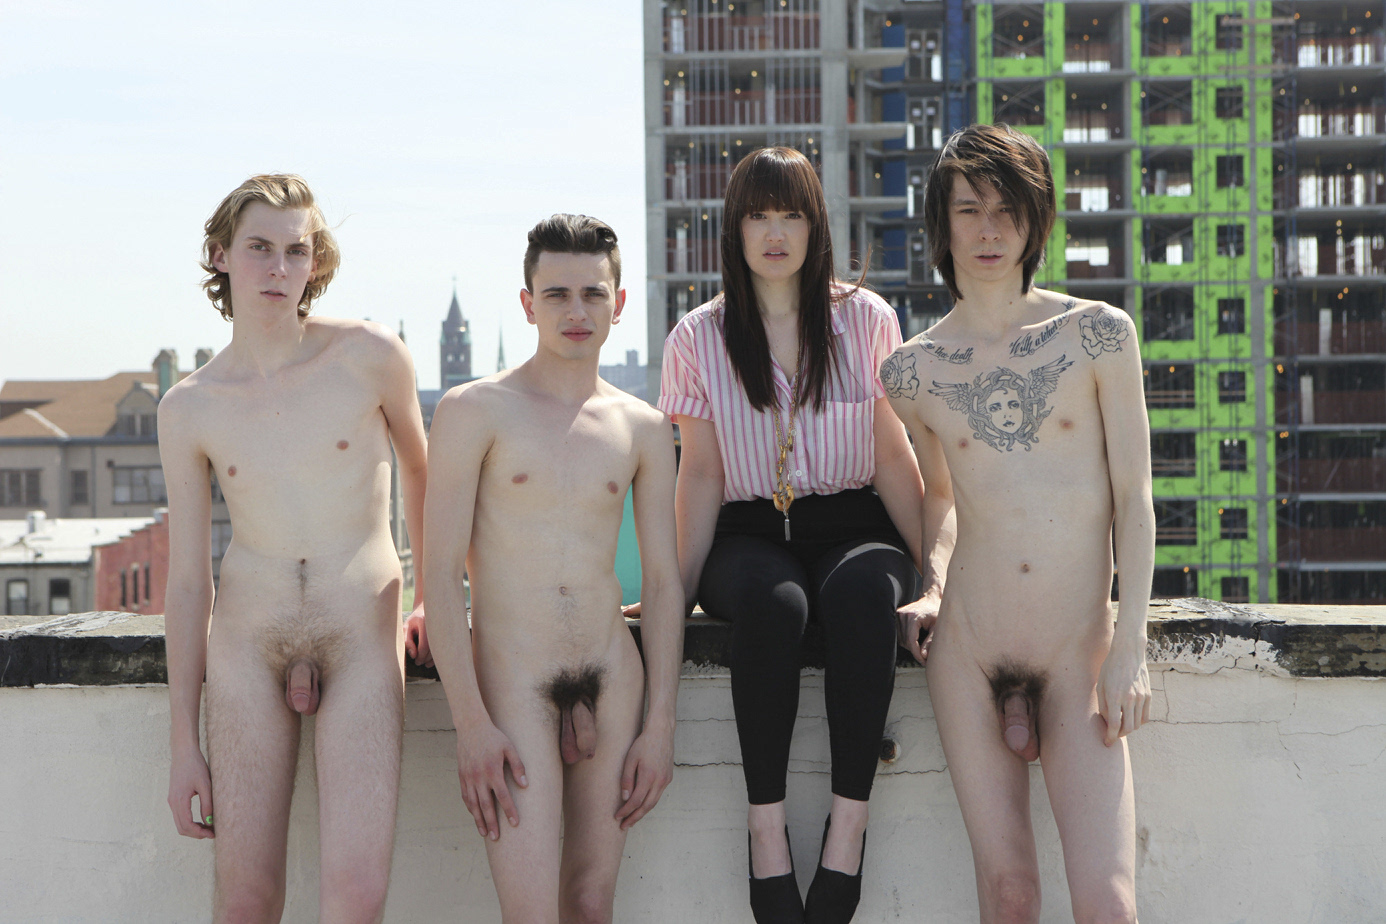 Bolly fake nude moving pics